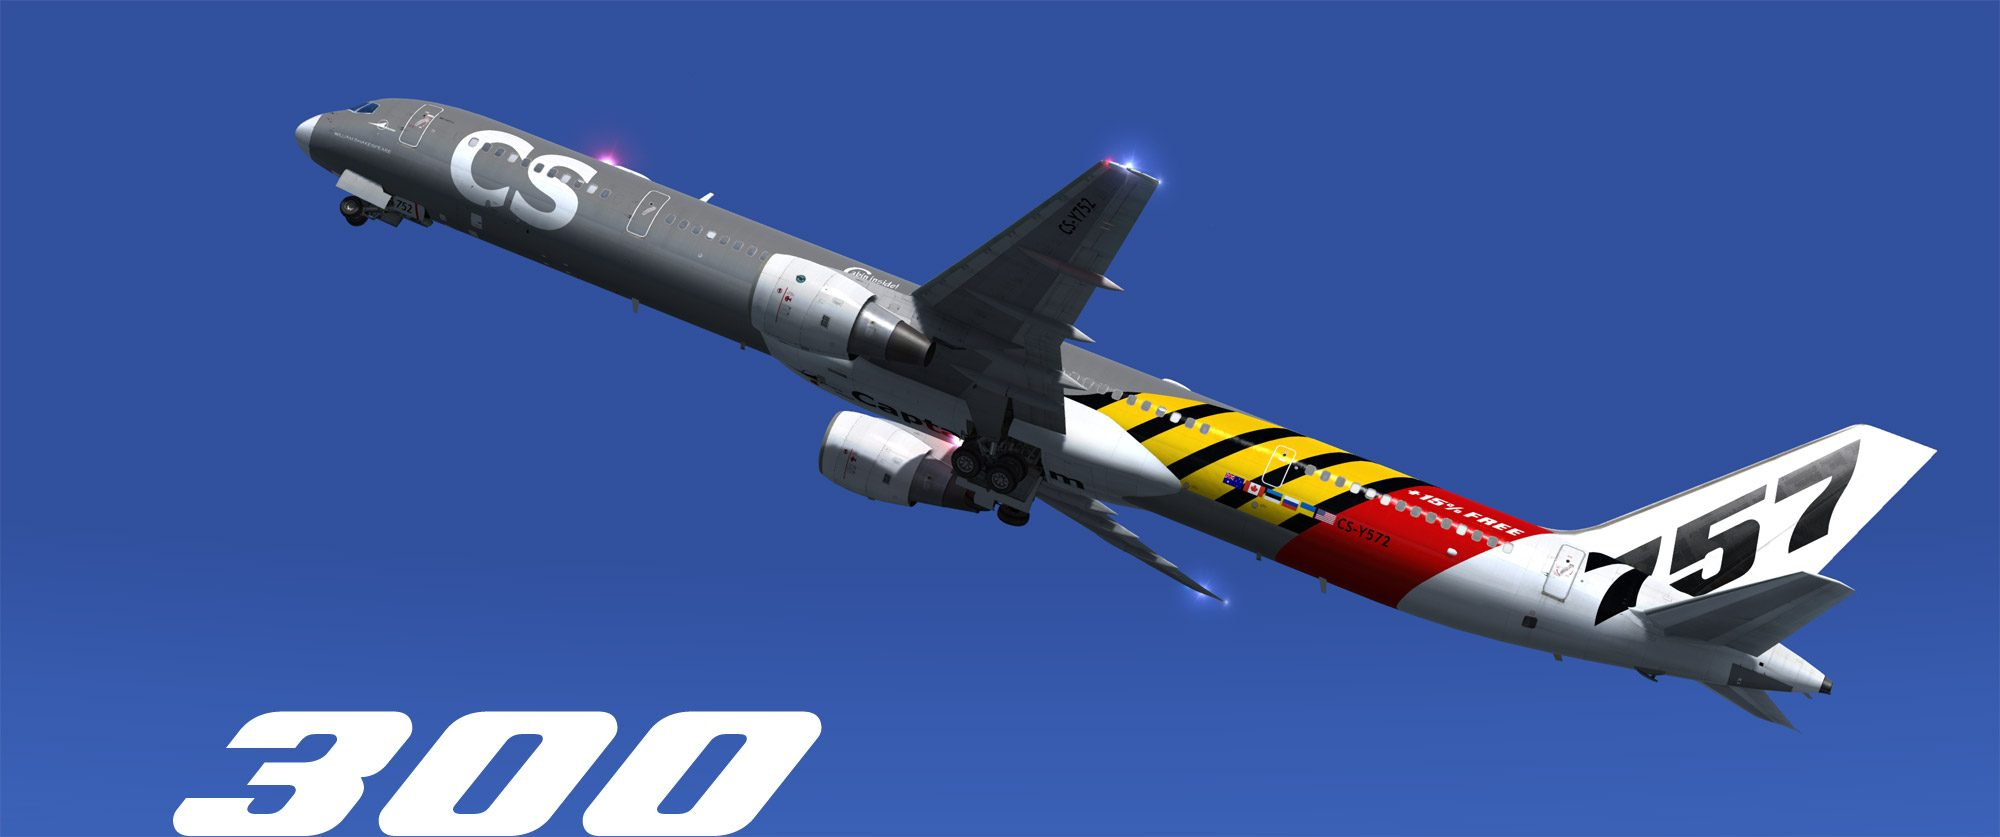 757-300